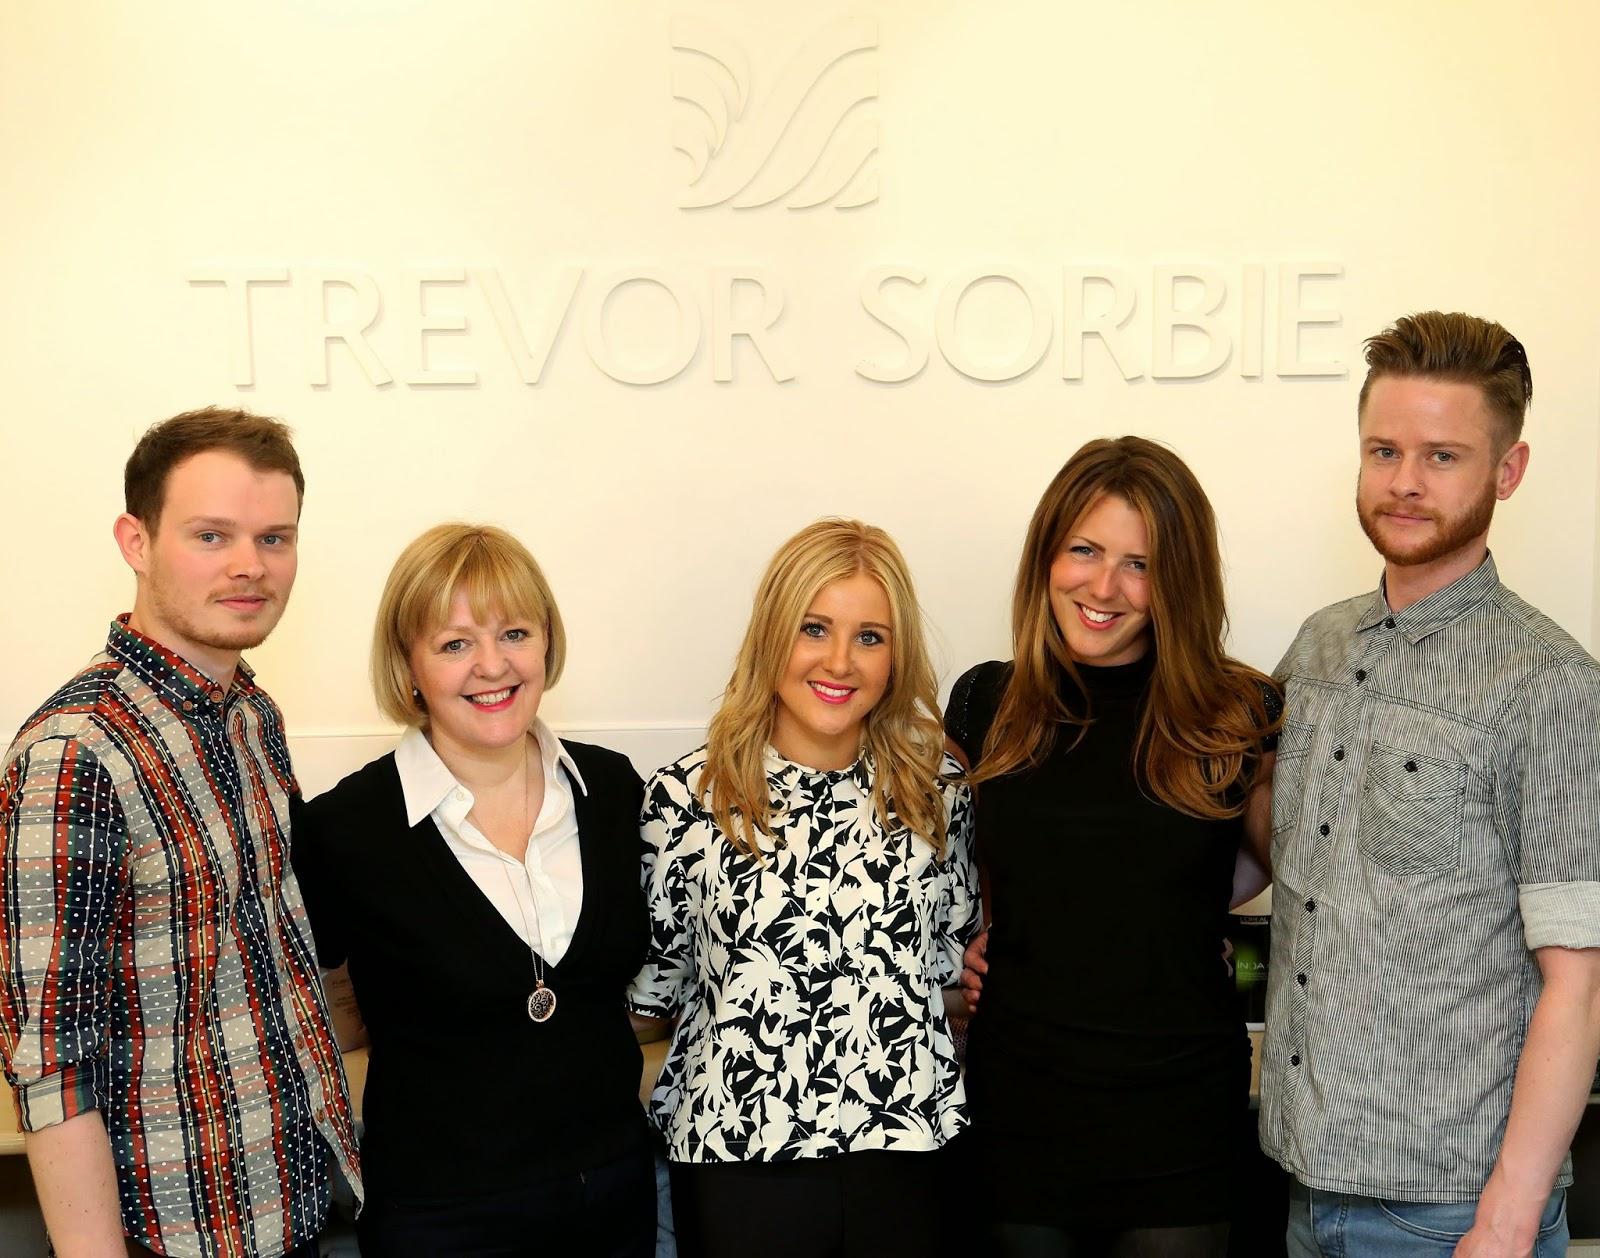 Brighton Bloggers: Trevor Sorbie Spring/Summer Event